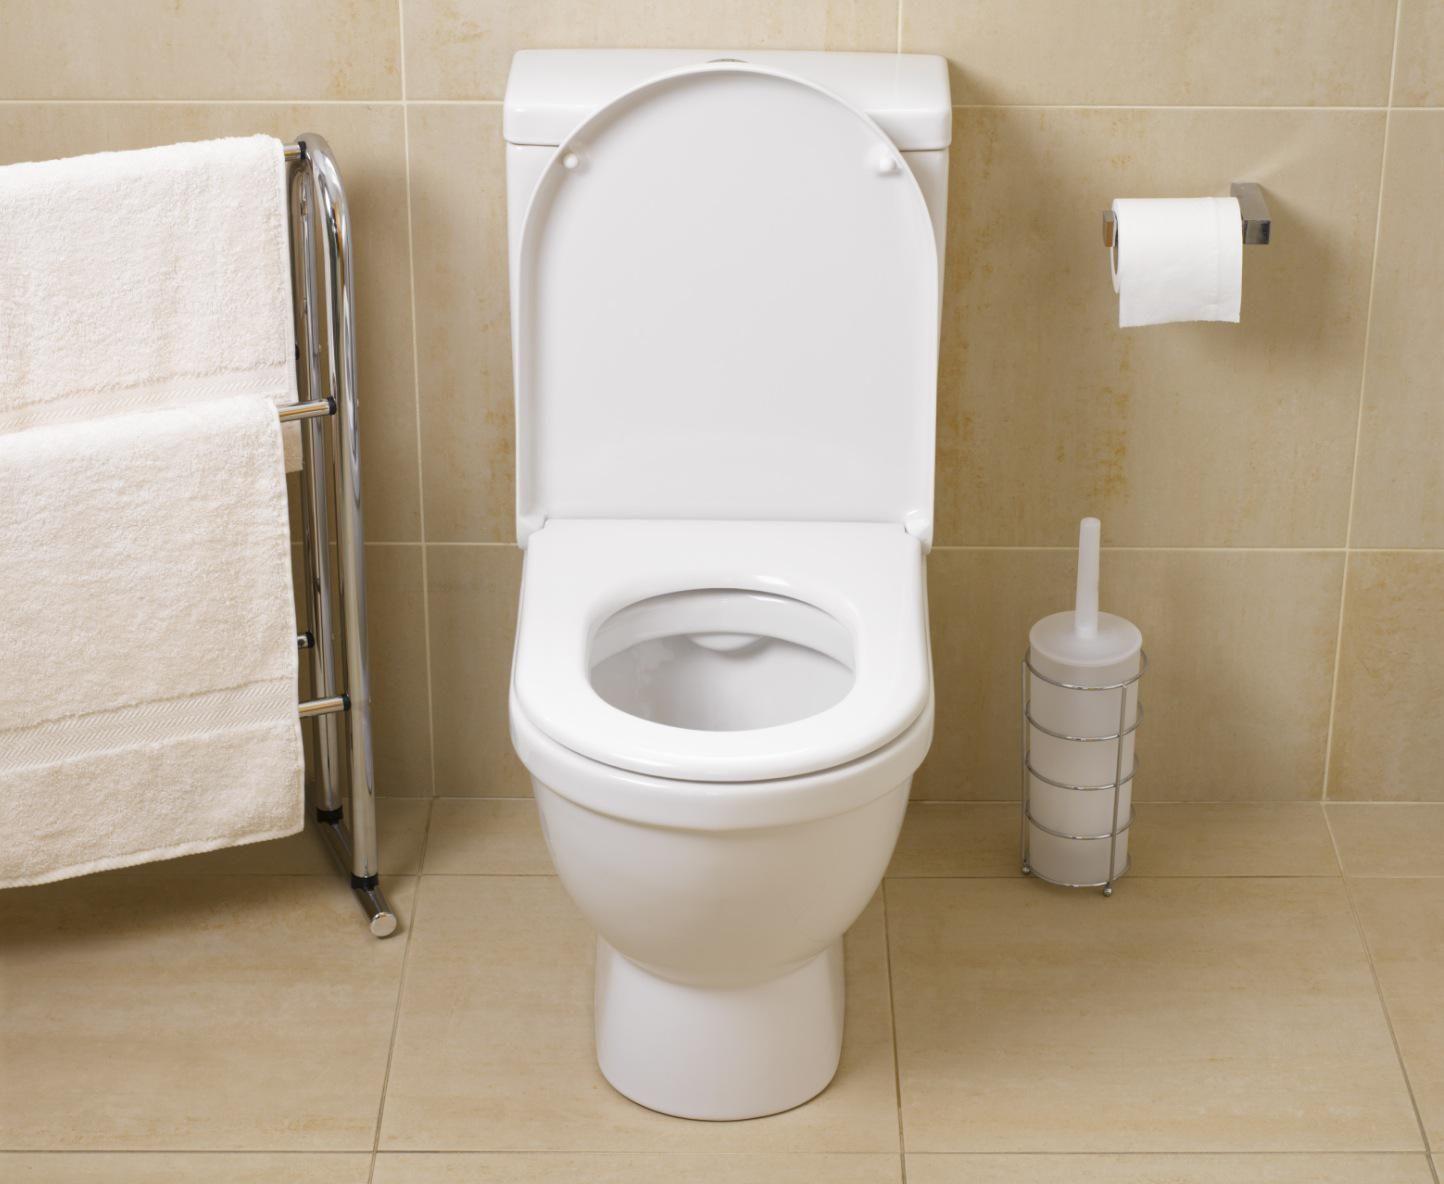 Bathroom clogged toilet - Toilet